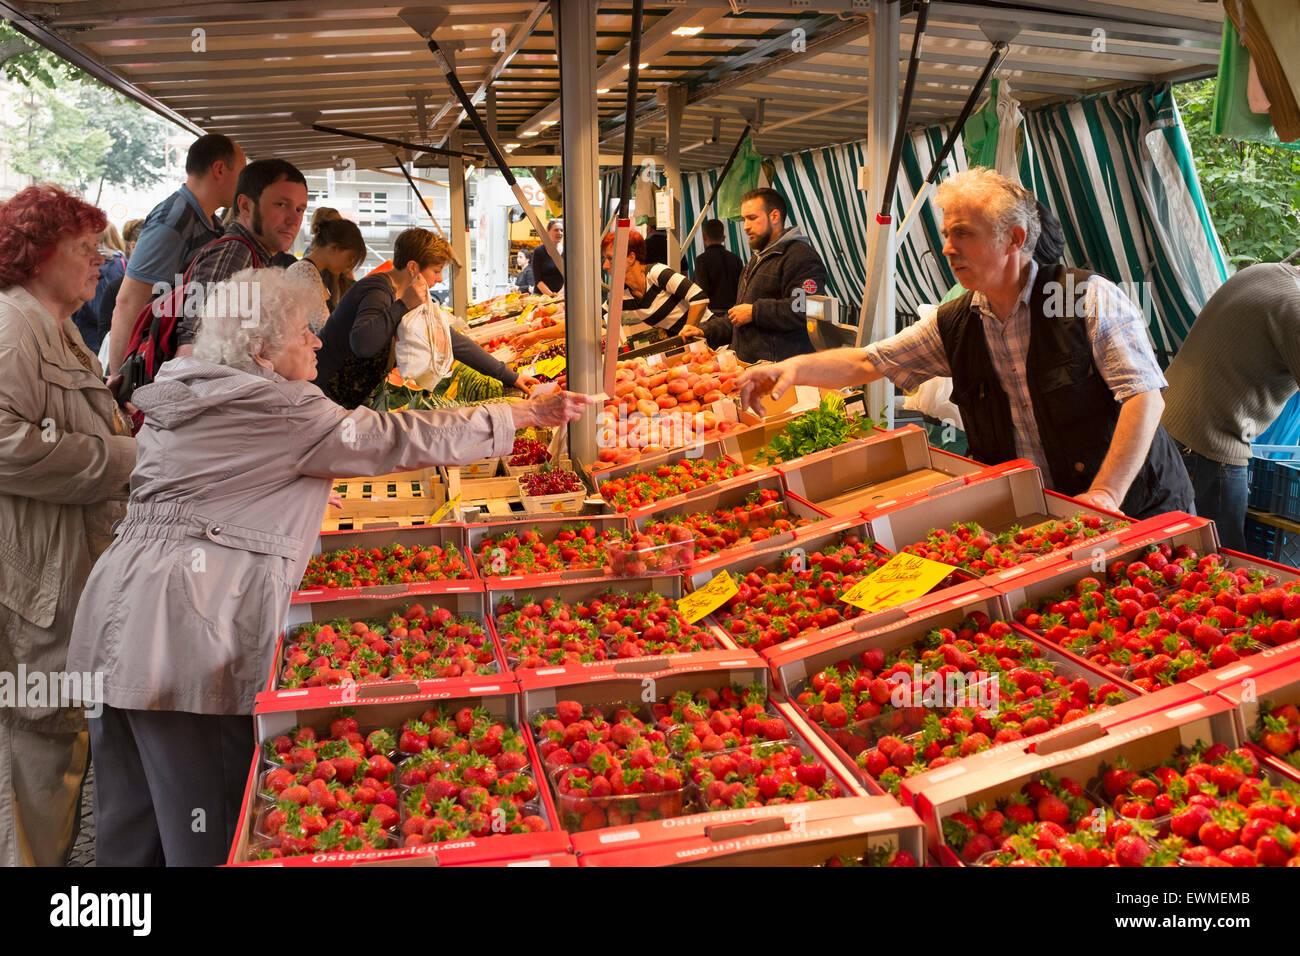 Fresas para venta en un stand en Boxhagener Platz Farmers' Market en el fin de semana en Friedrichshain Berlín Imagen De Stock